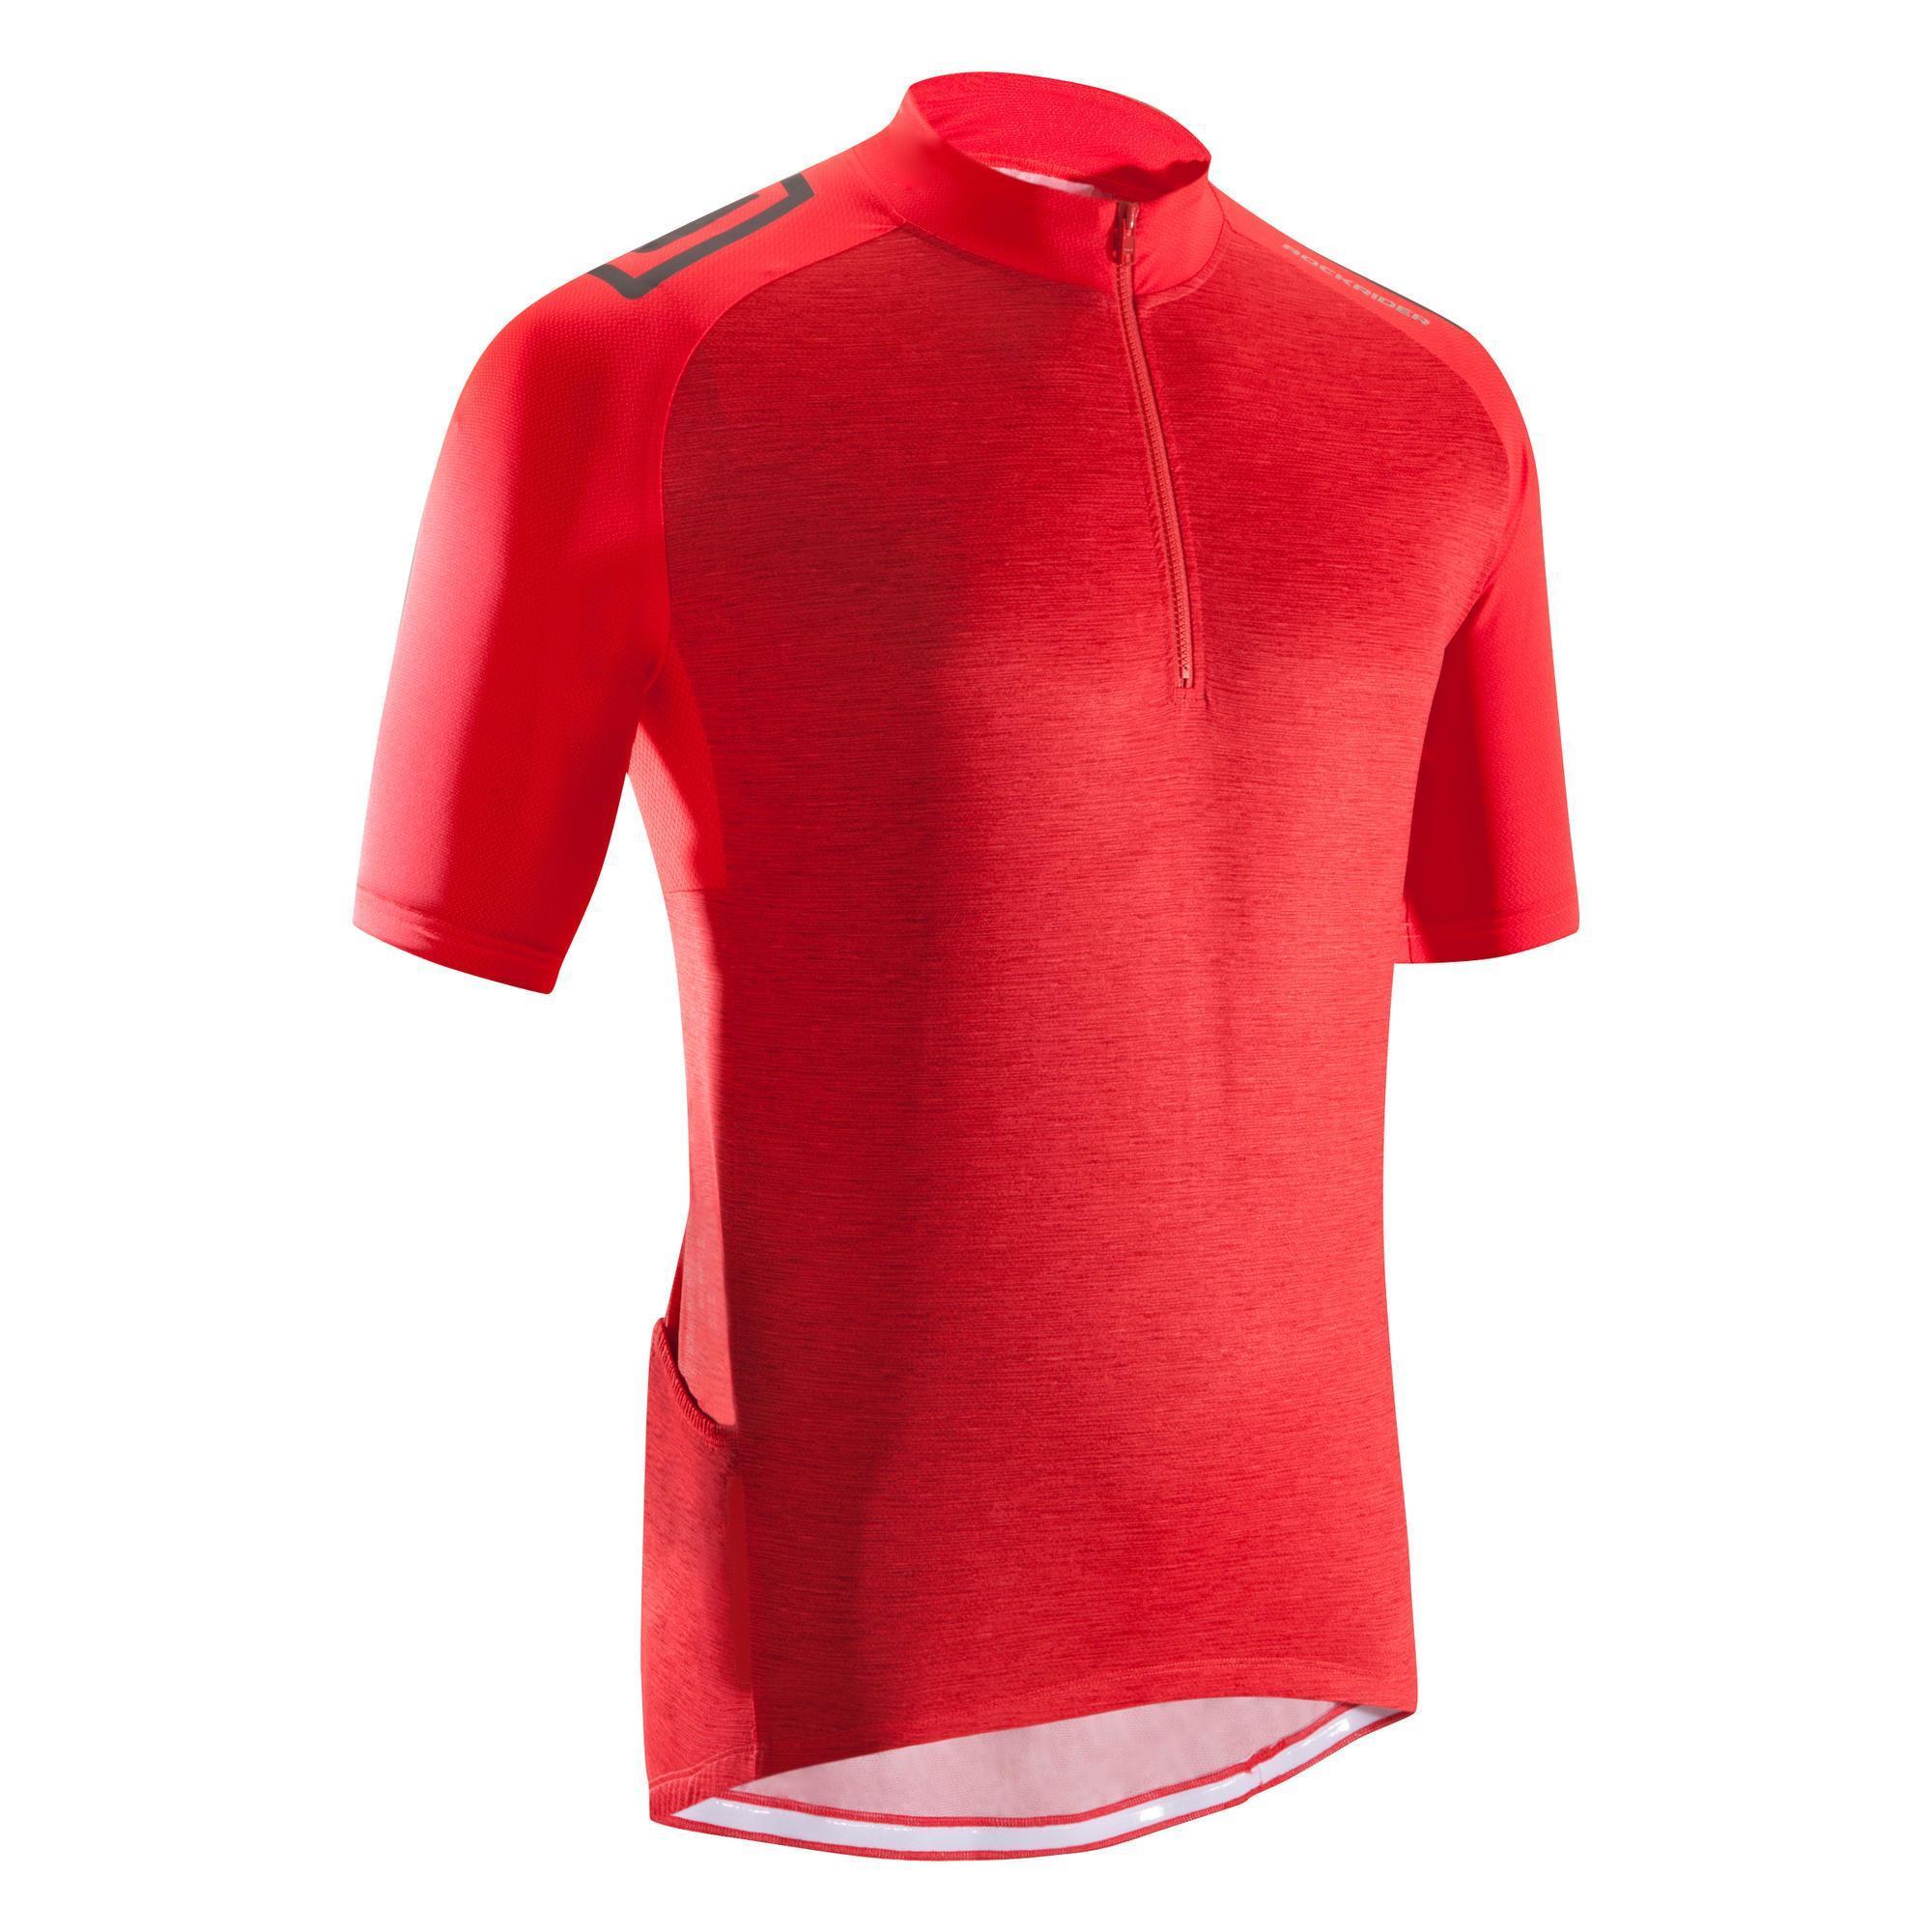 Fahrrad-Trikot MTB ST 500 Herren fluo rot | Sportbekleidung > Trikots > Fahrradtrikots | Rot - Bordeaux - Schwarz | Baumwolle | Rockrider